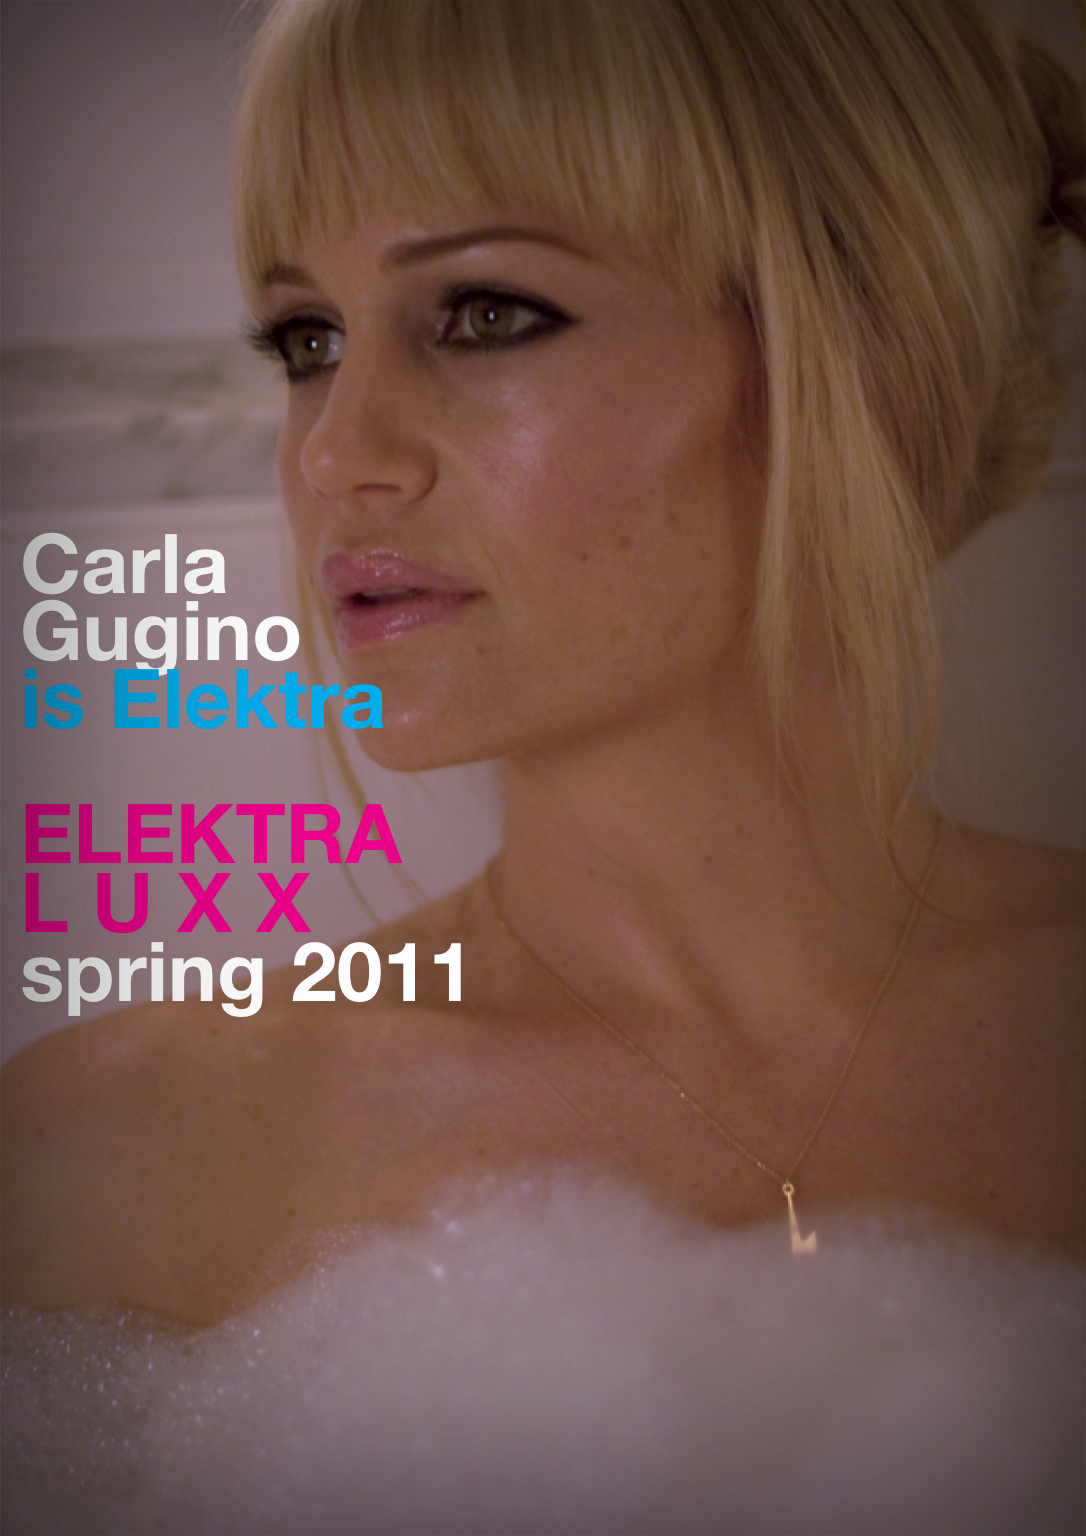 Carla Gugino in Electra Luxx